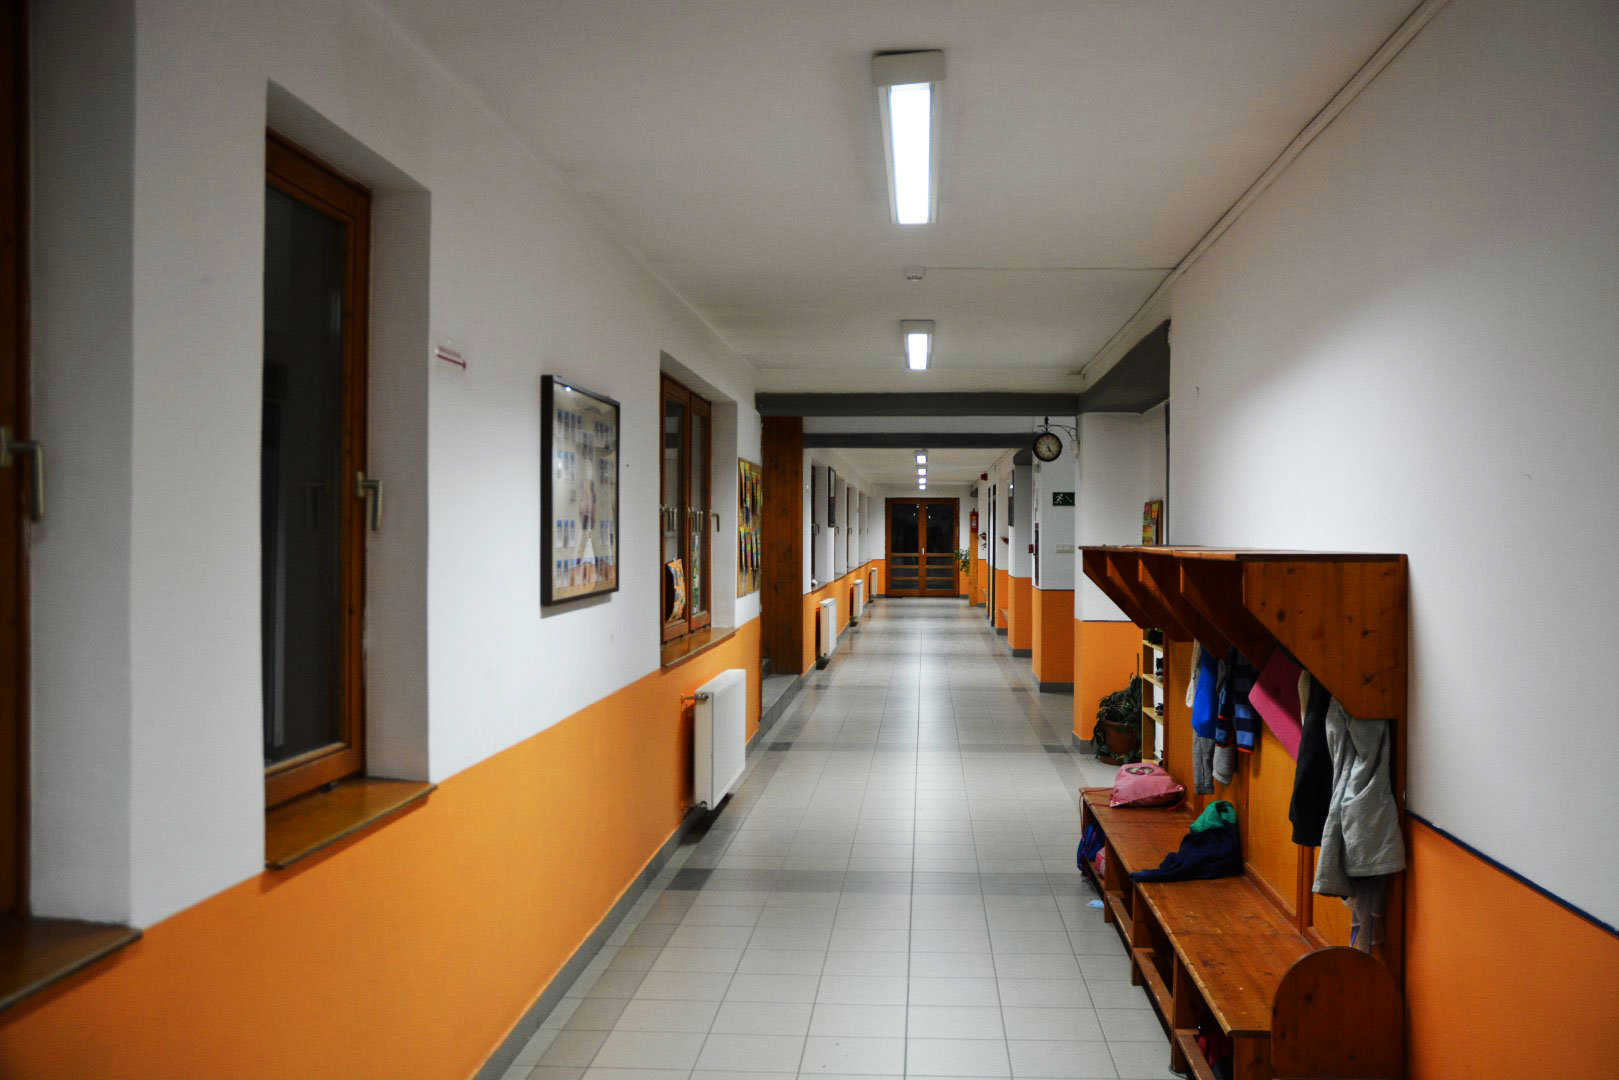 dml_hungary_referencia_telki_pipacsvirag_altalanos_iskola_vilagitaskorszerusites (10)